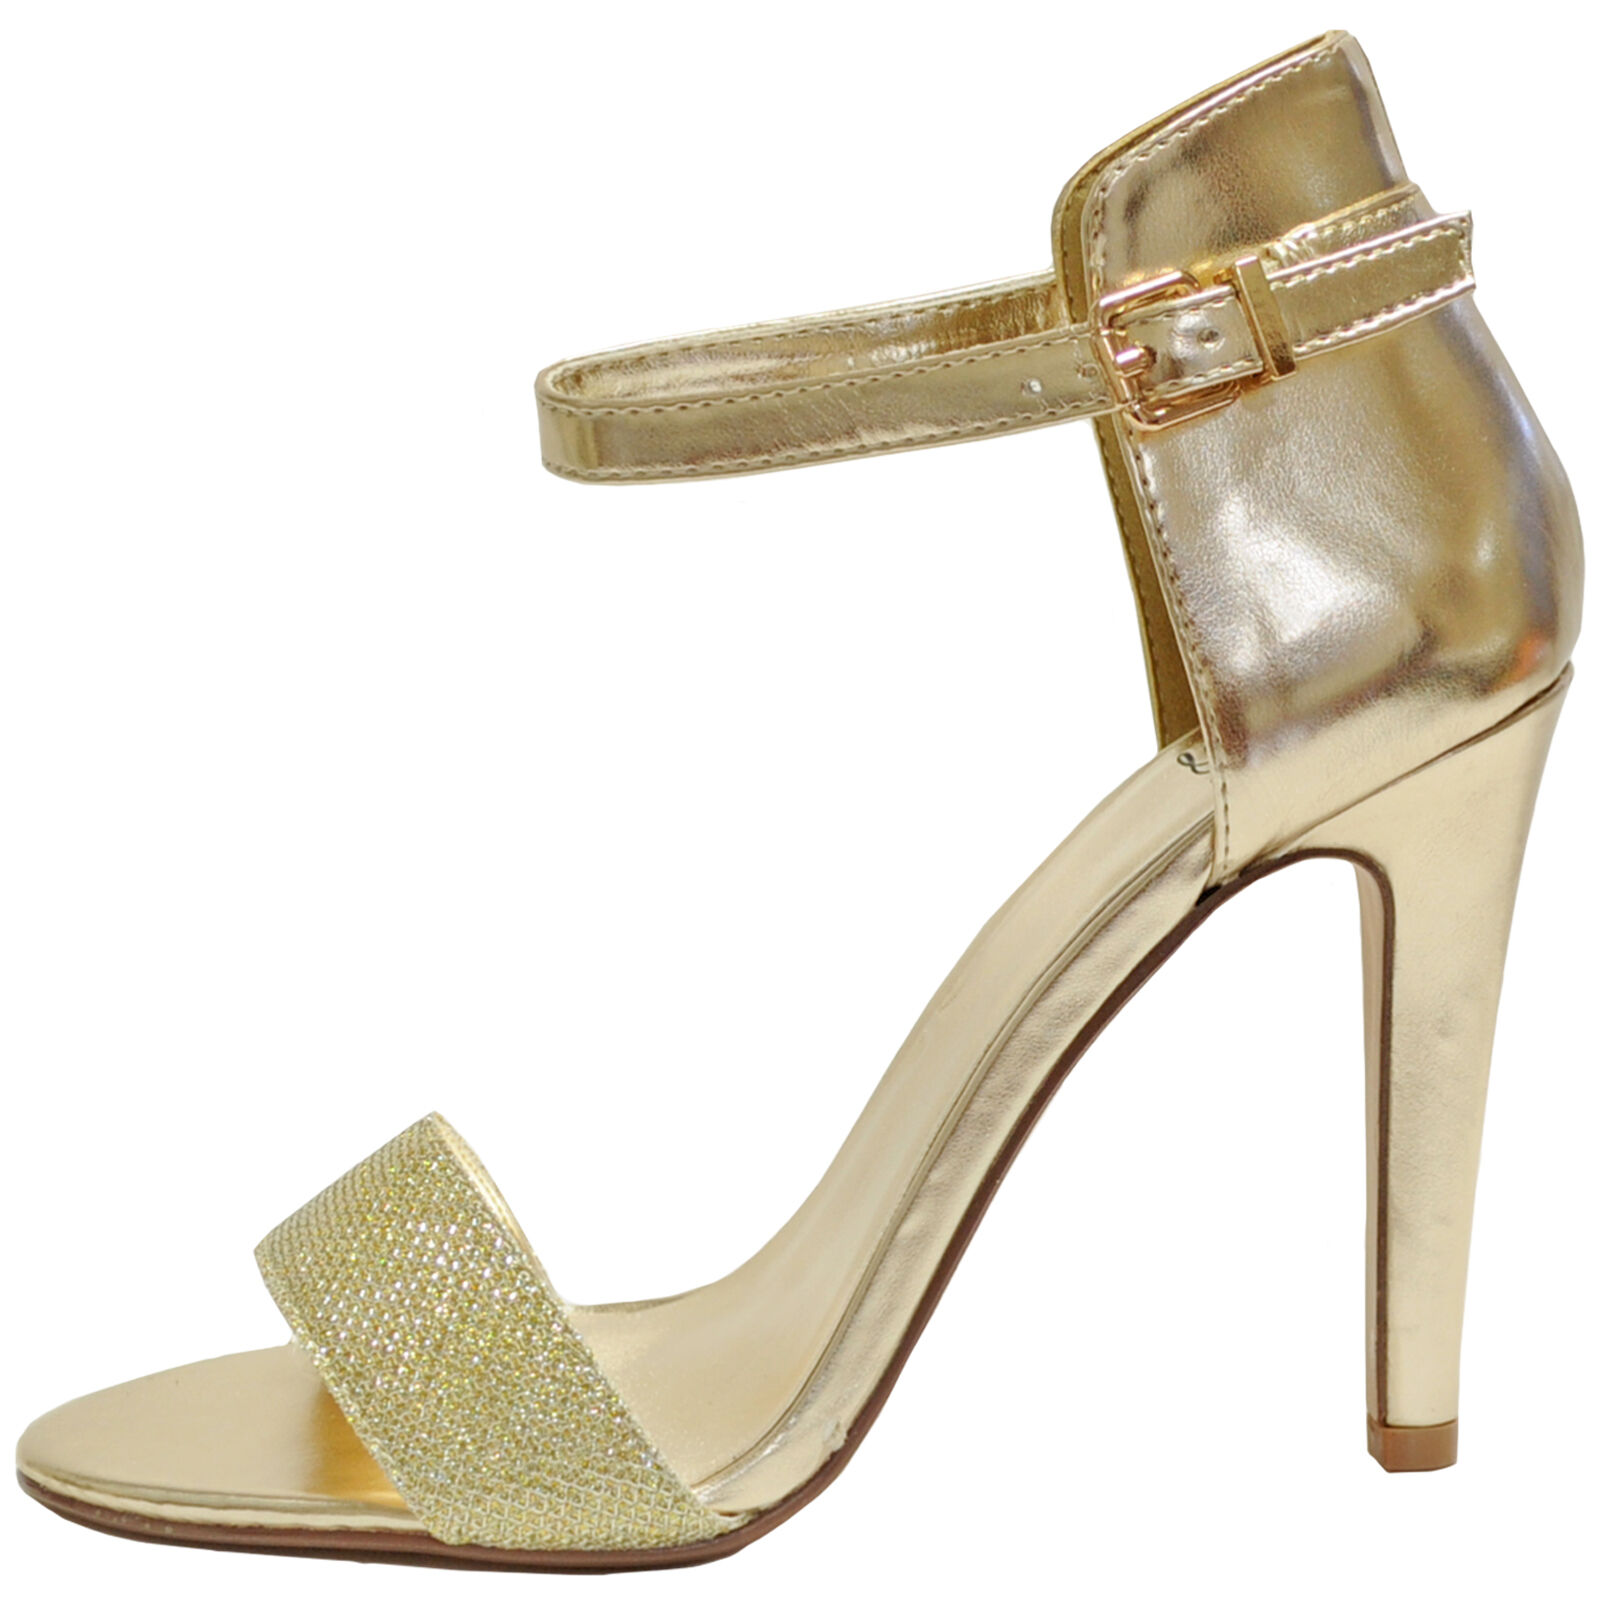 New women's shoes open toe stilettos high heel dressy gold fashion formal prom  1